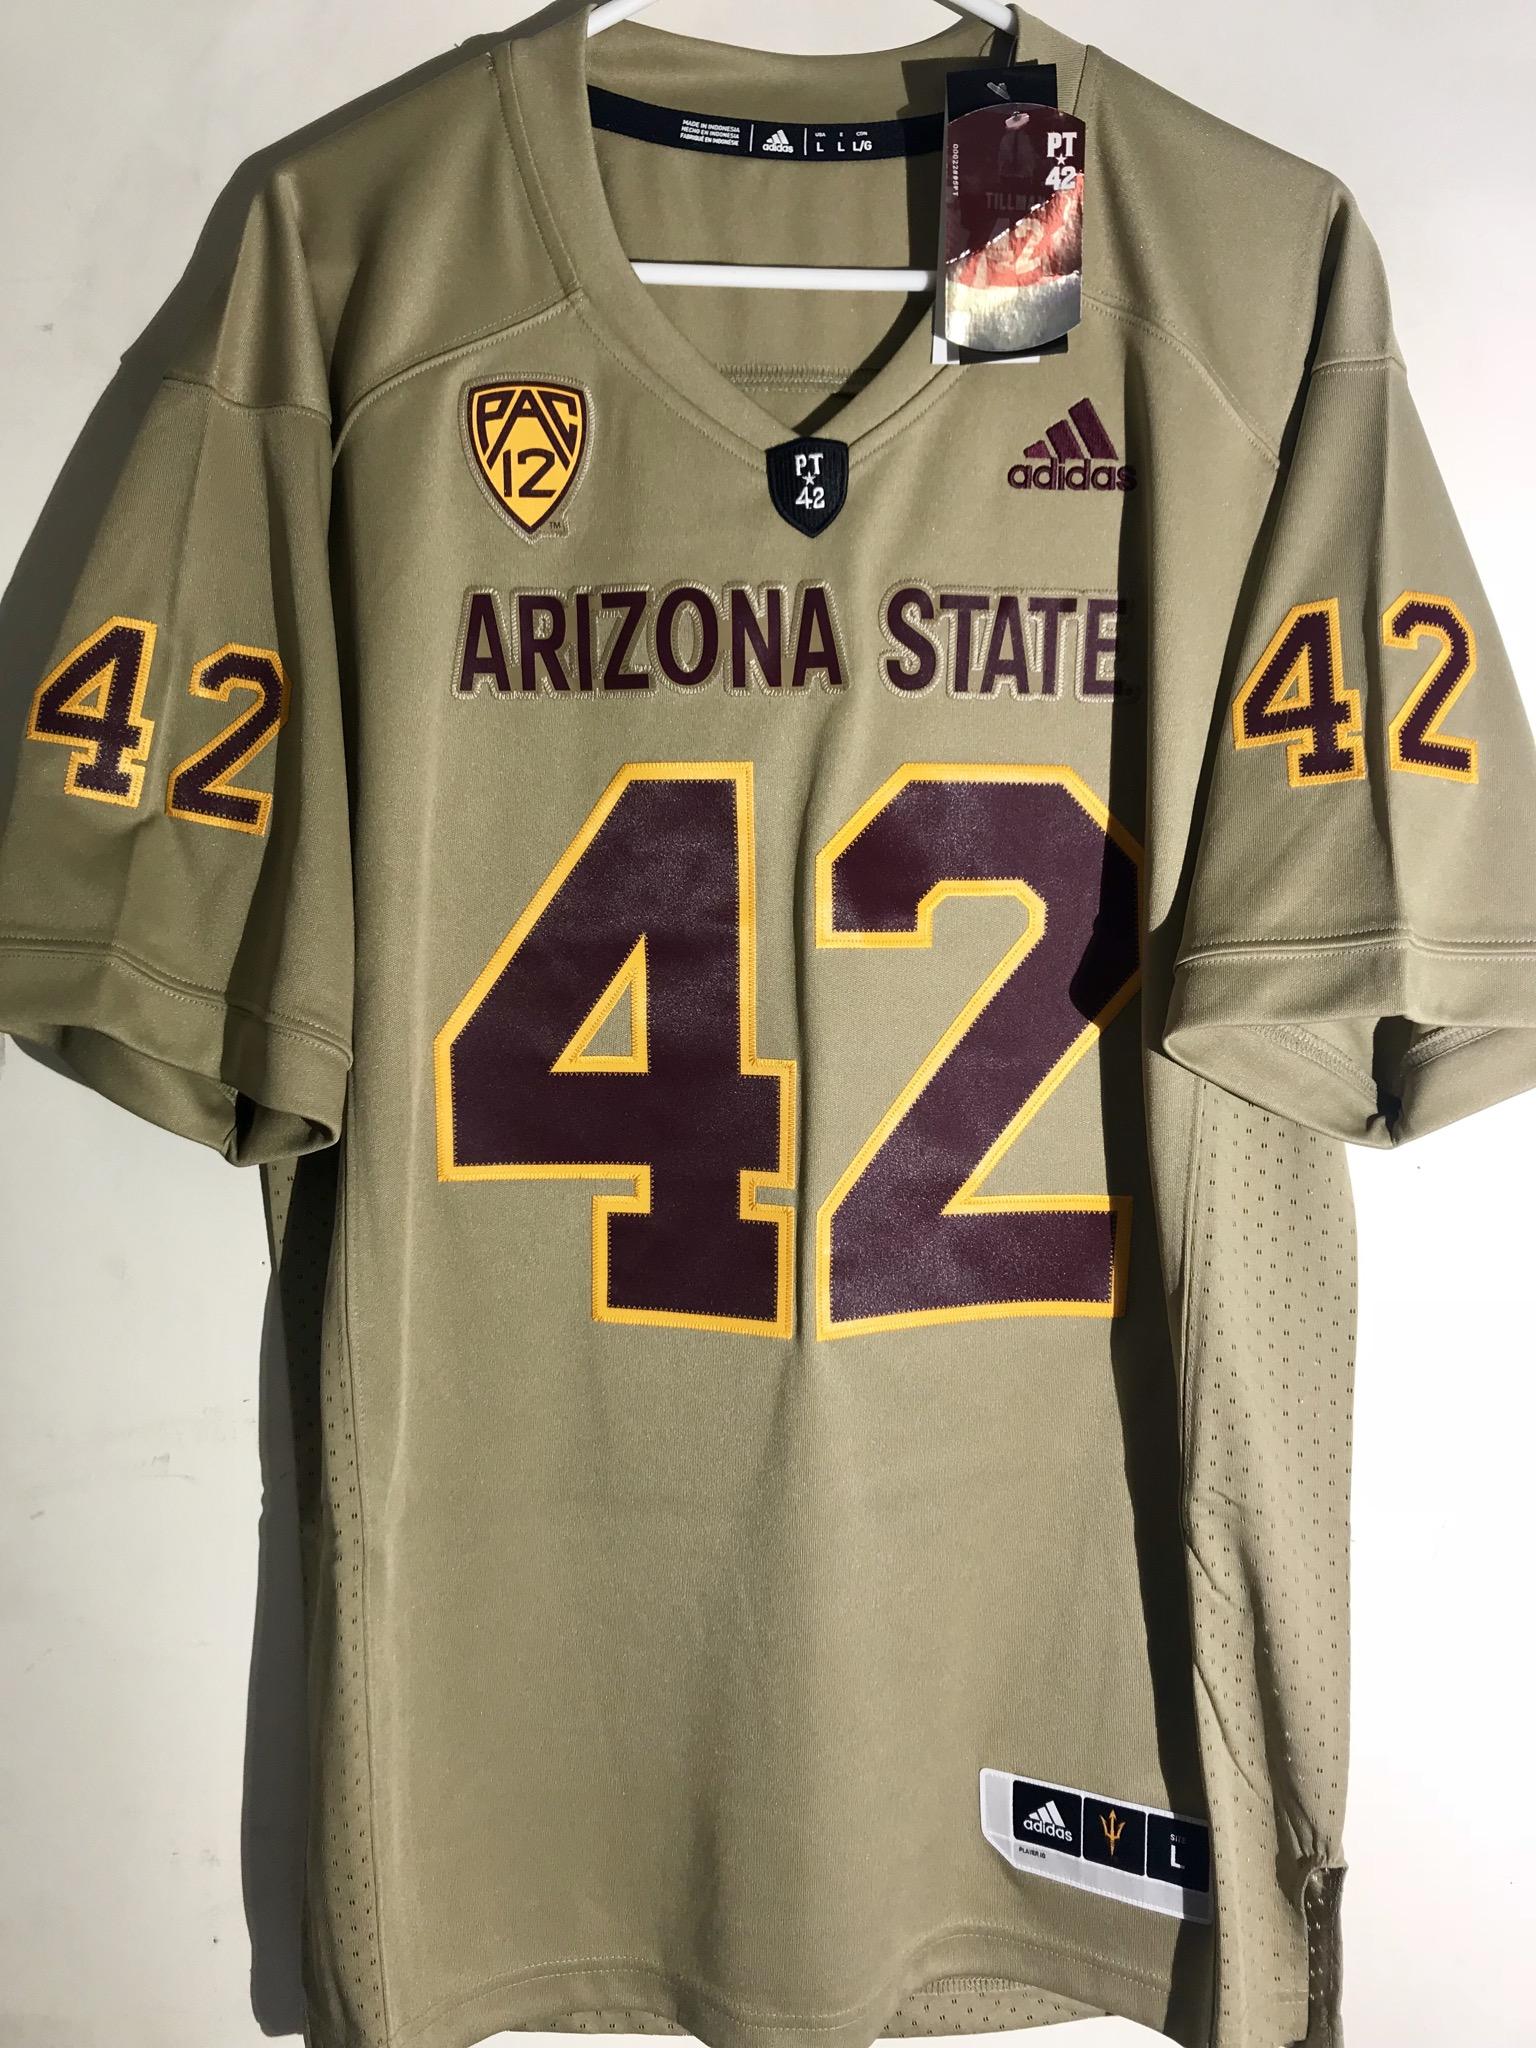 new york f921d 9ec44 Details about Adidas Premier NCAA Jersey Arizona State Sun Devils Pat  Tillman Tan sz M